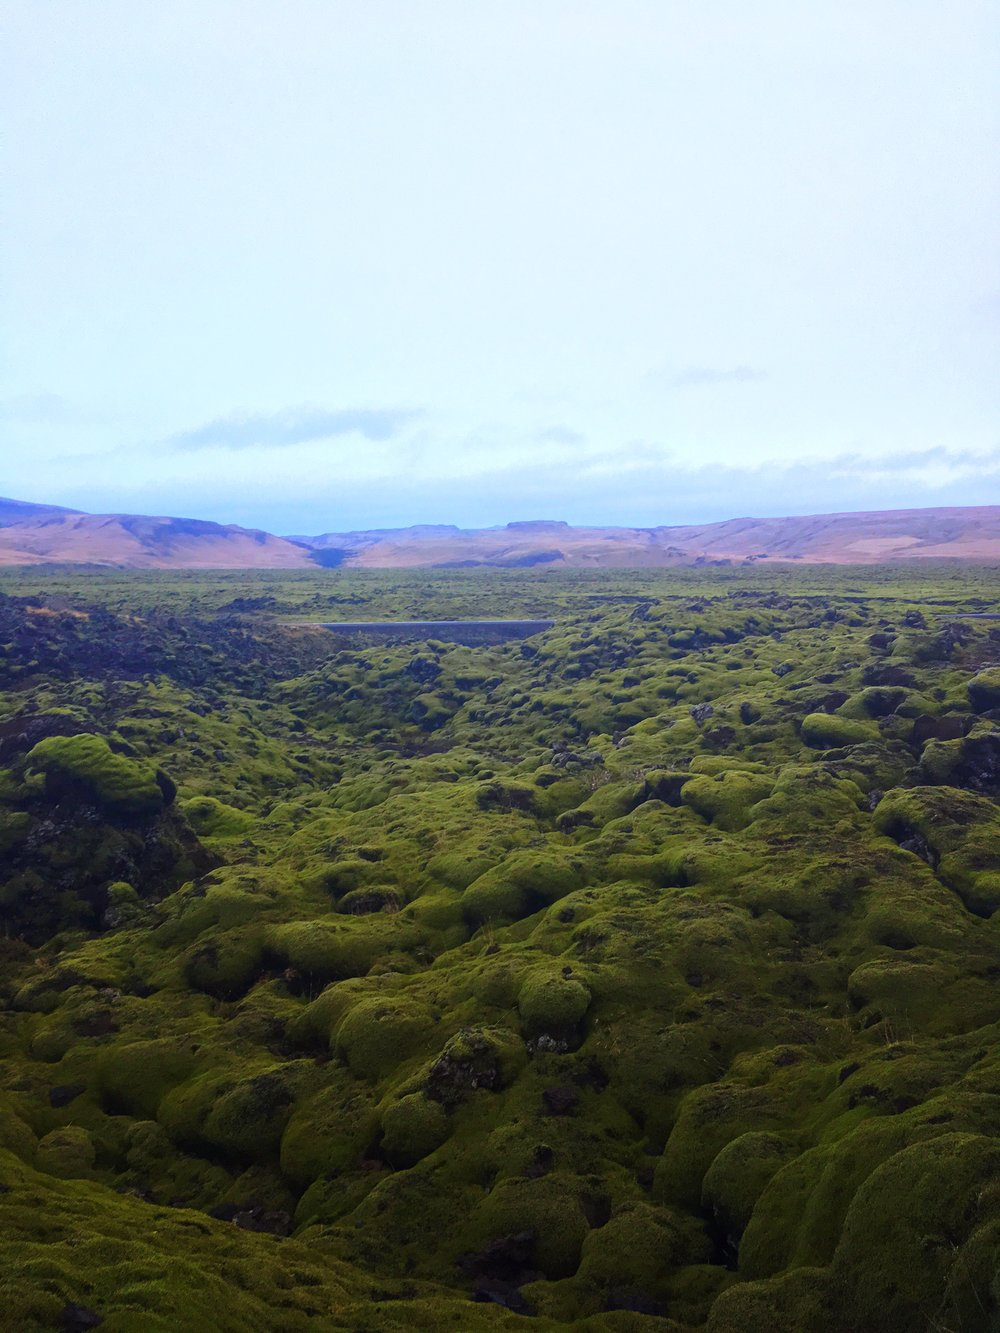 Moss grows on lava rocks along Iceland's Ring Road in Skaftarhreppur.